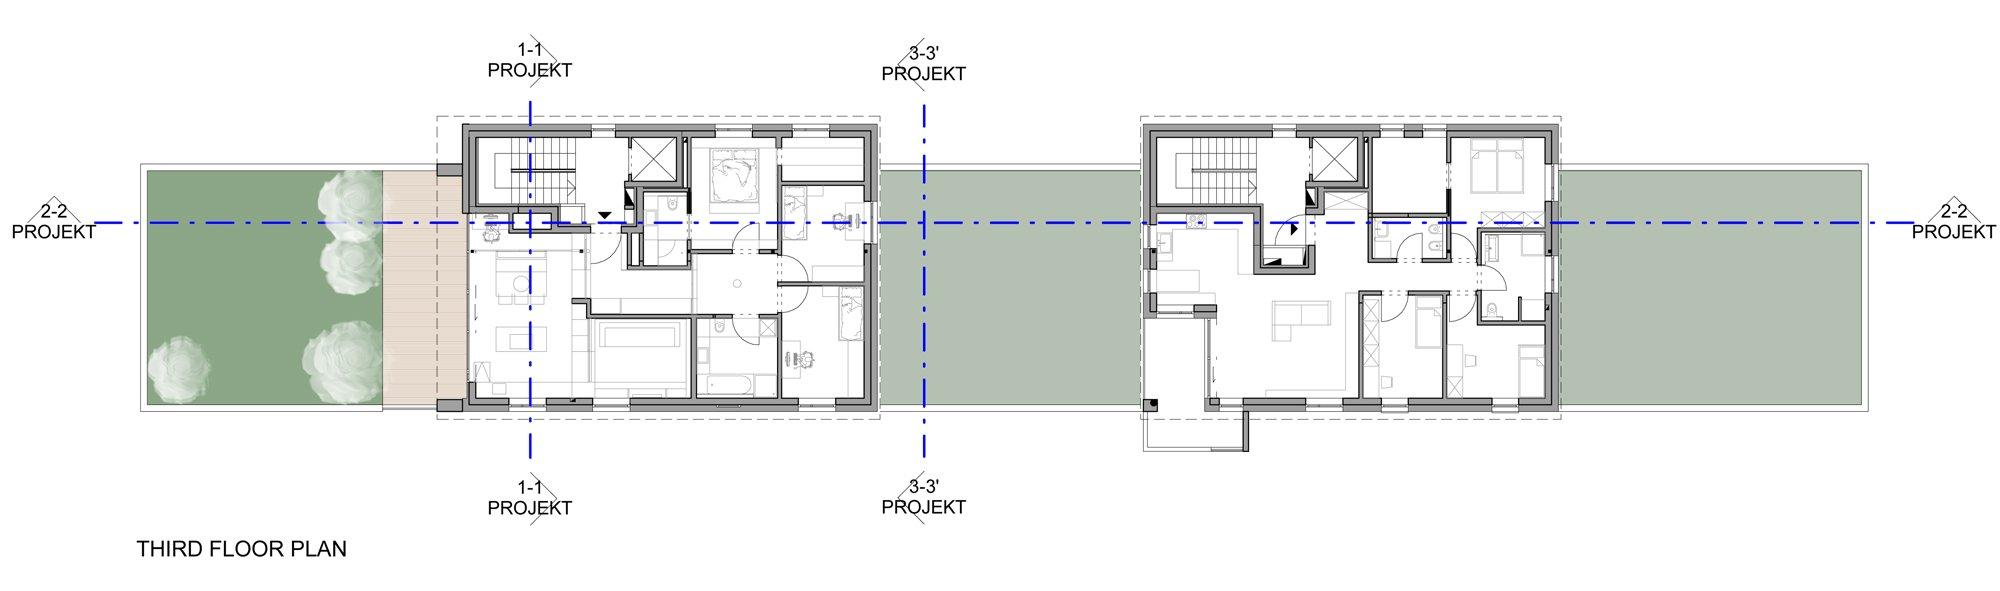 Plan of the Third Floor }